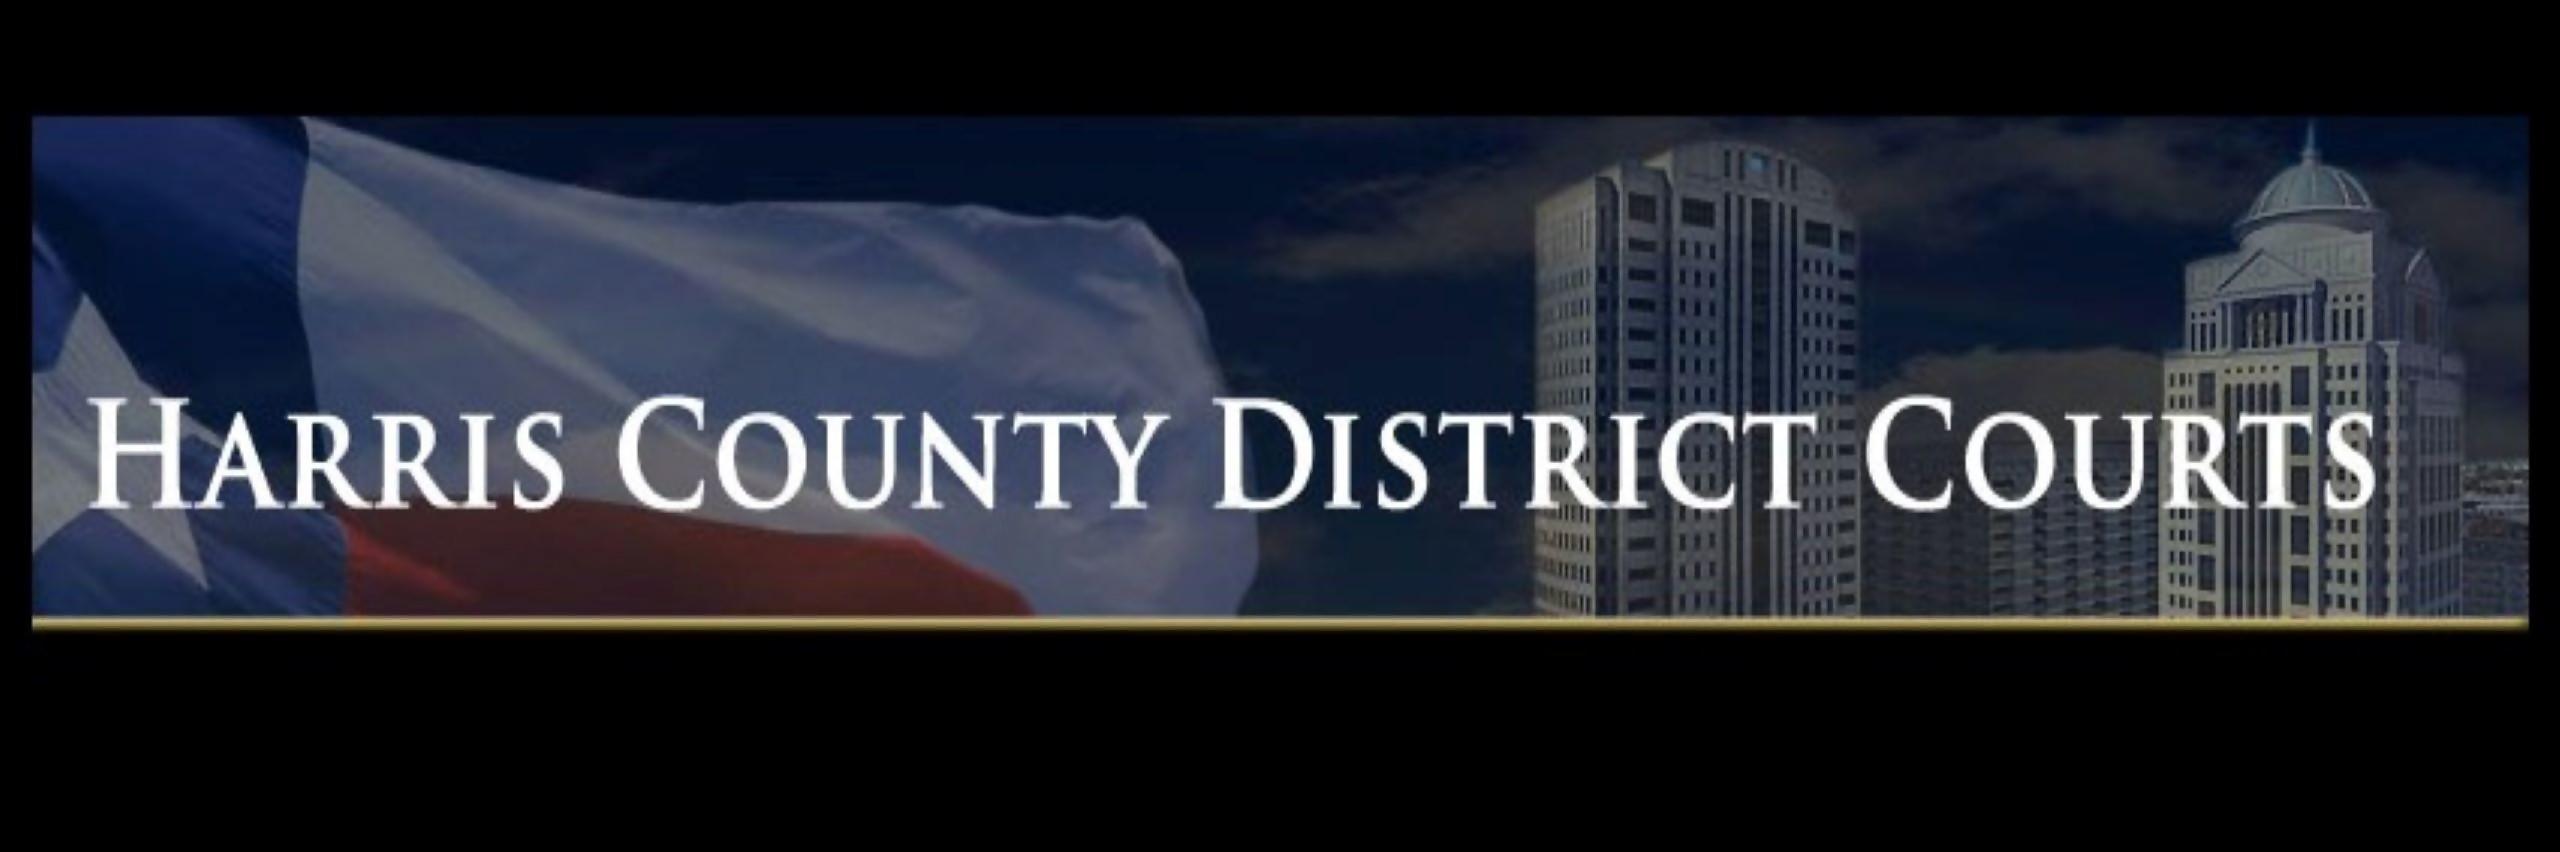 482nd District Court Live Stream